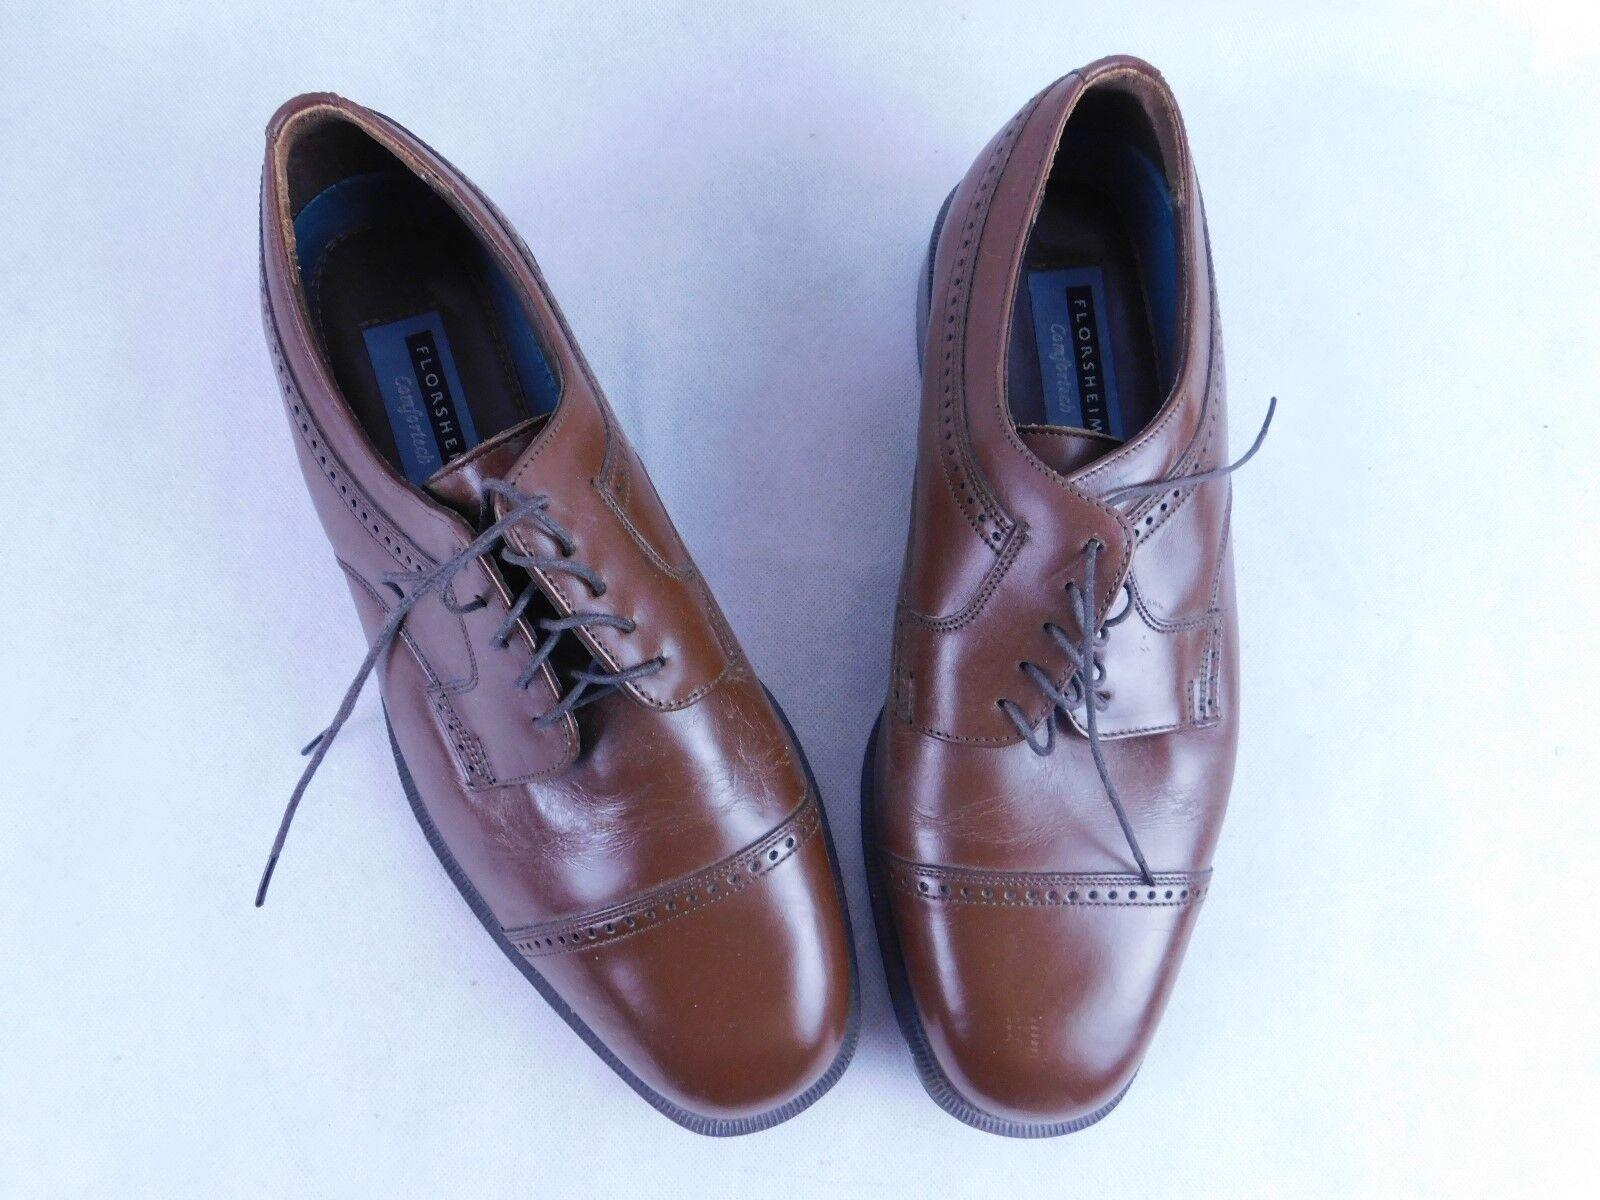 Florsheim Dress Oxford 21003 Shoes Toe Cap Brown 21003 Oxford Comfortech Size 10 892dd3